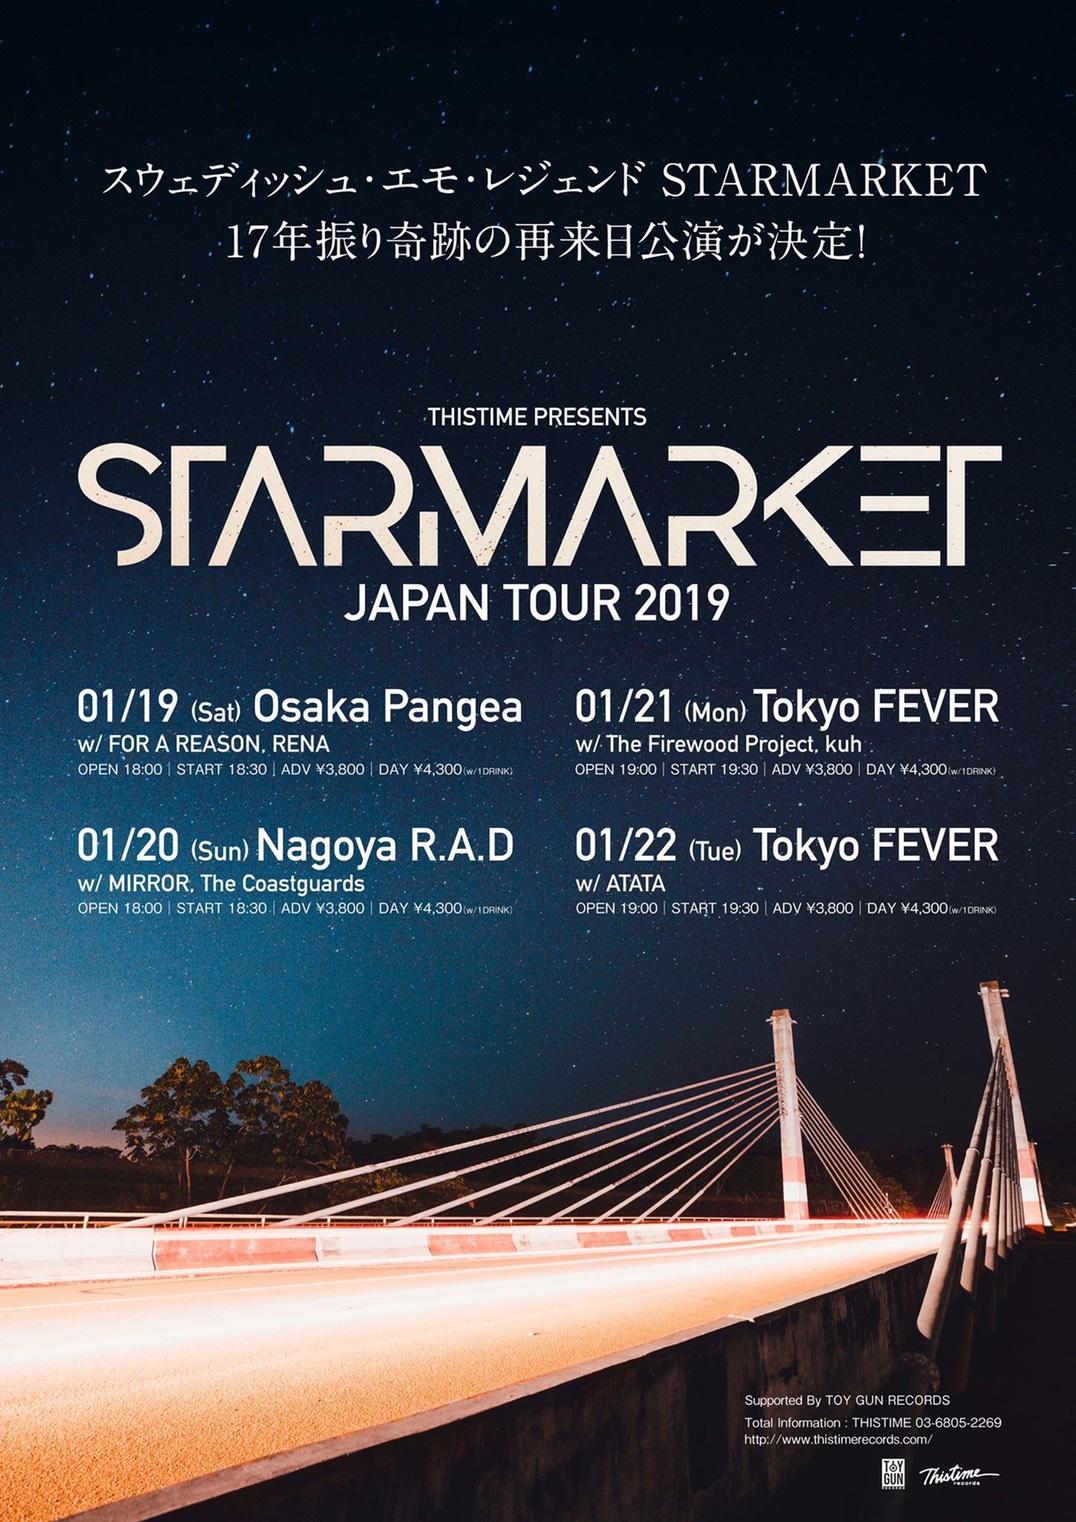 STARMARKET JAPAN TOUR 2019